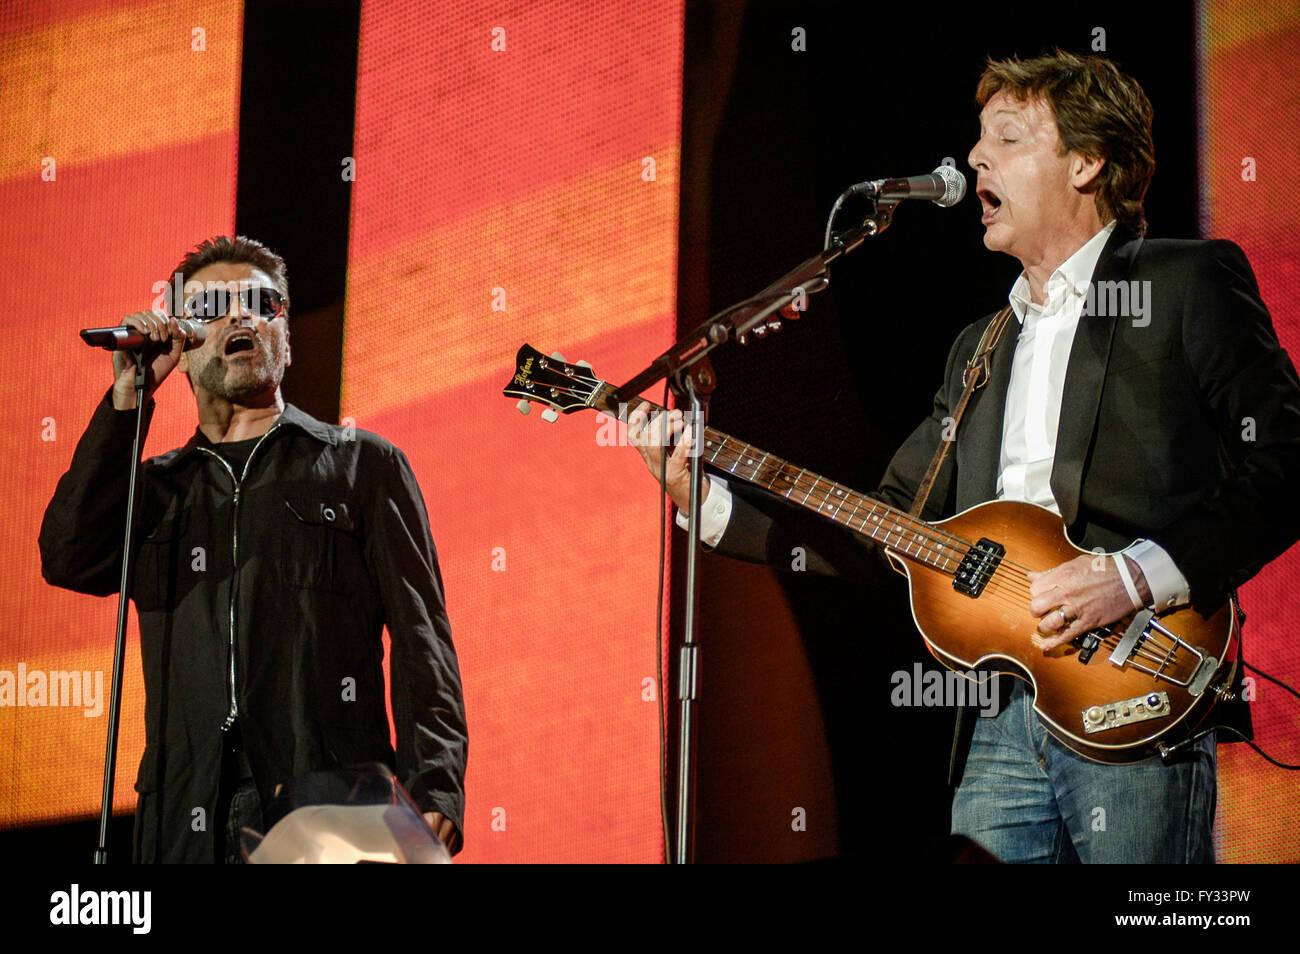 2 July 2005 Paul McCartney And George Michael